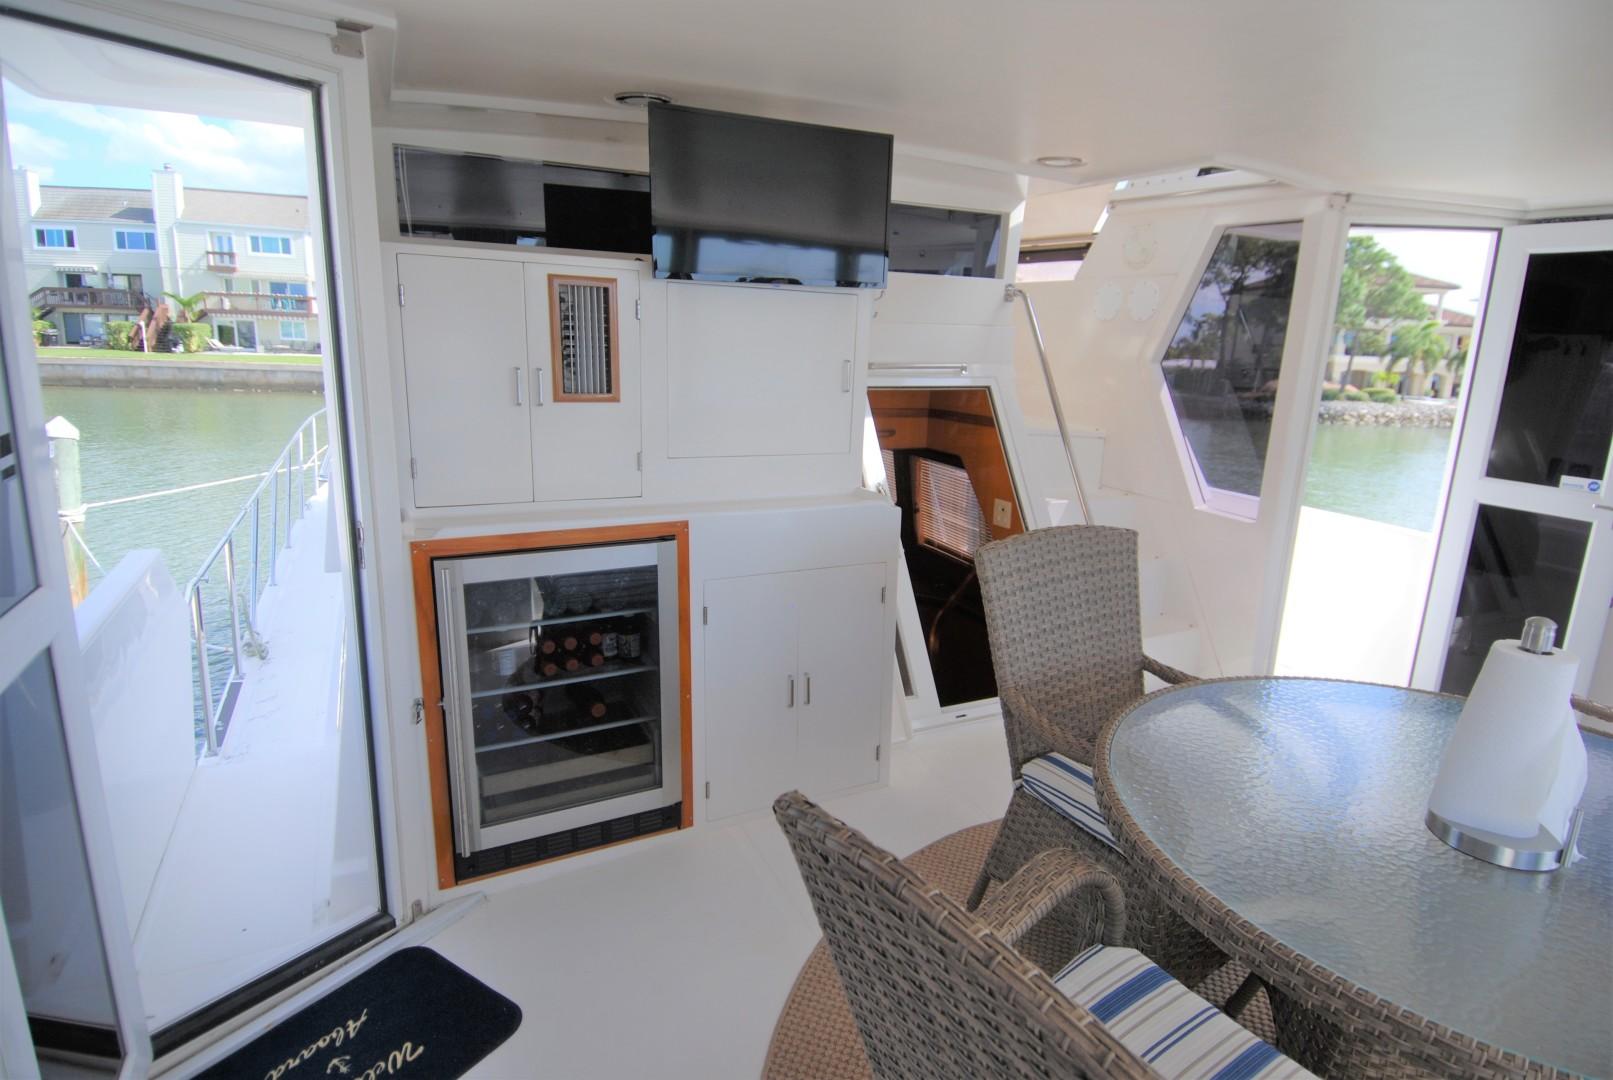 Novatec-Cockpit Motoryacht 2003-Liberty Dunedin-Florida-United States-1544755 | Thumbnail